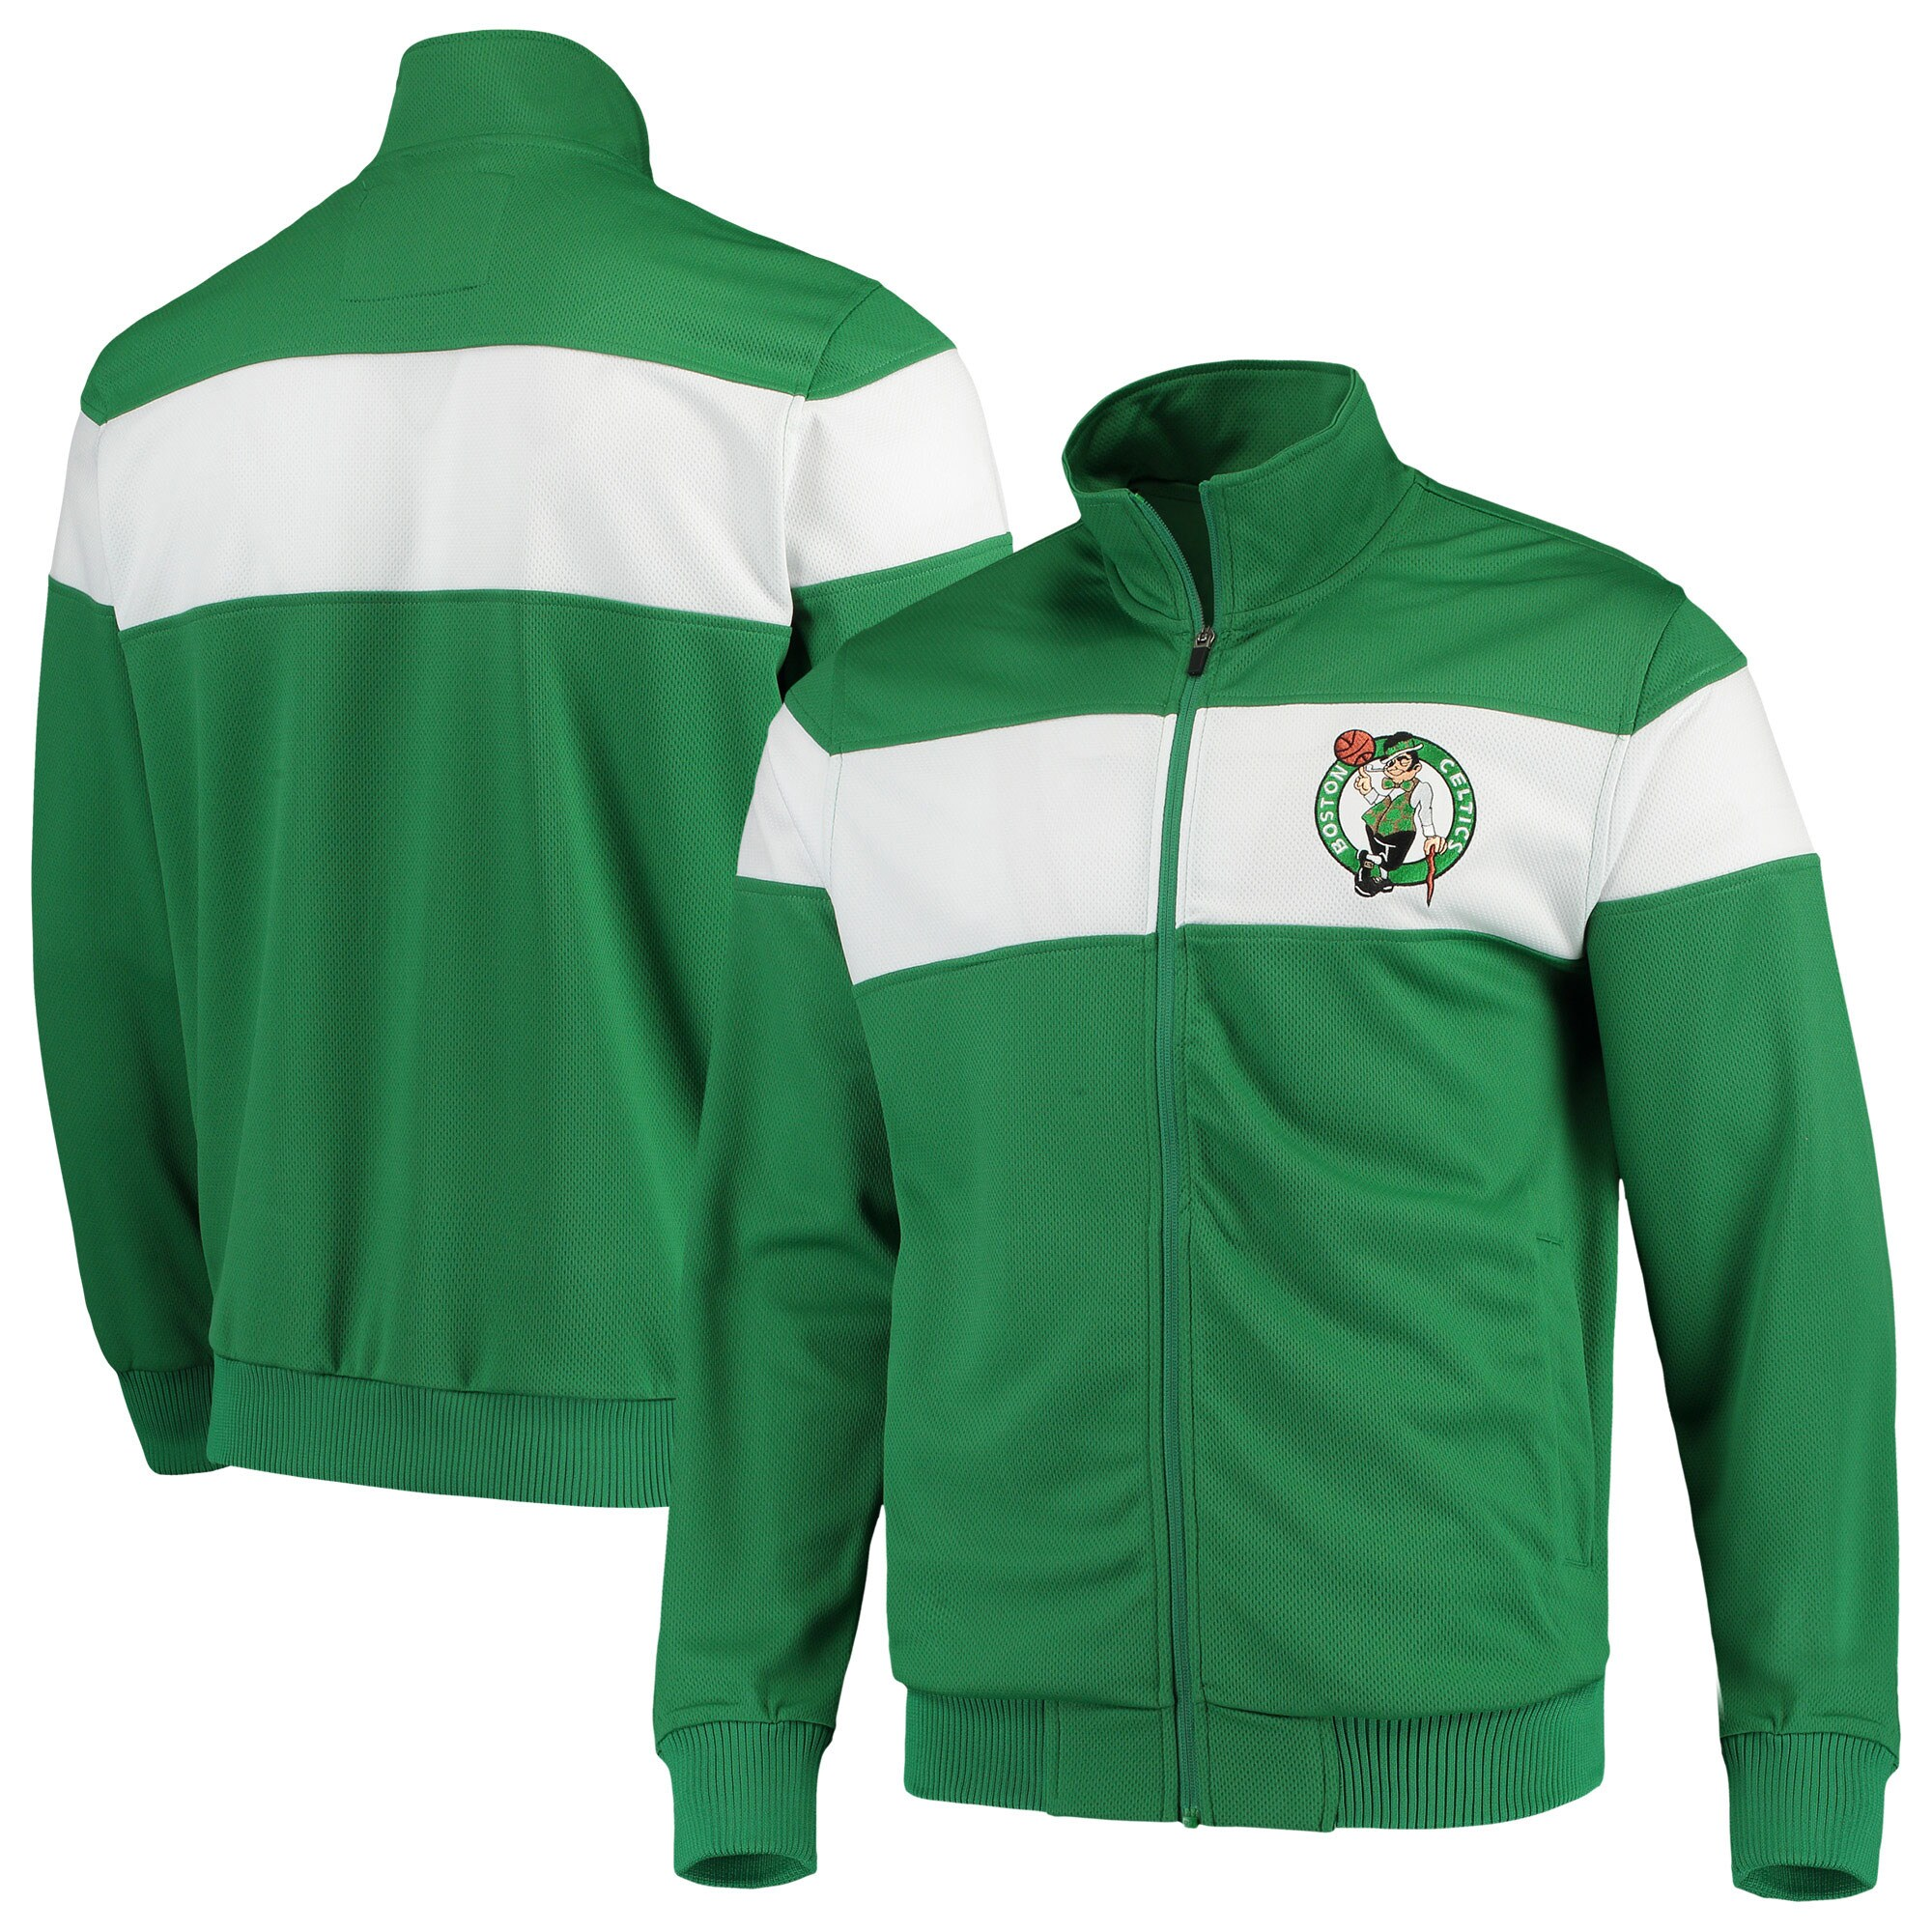 Boston Celtics G-III Sports by Carl Banks Strength Striped Full-Zip Track Jacket - Kelly Green/White